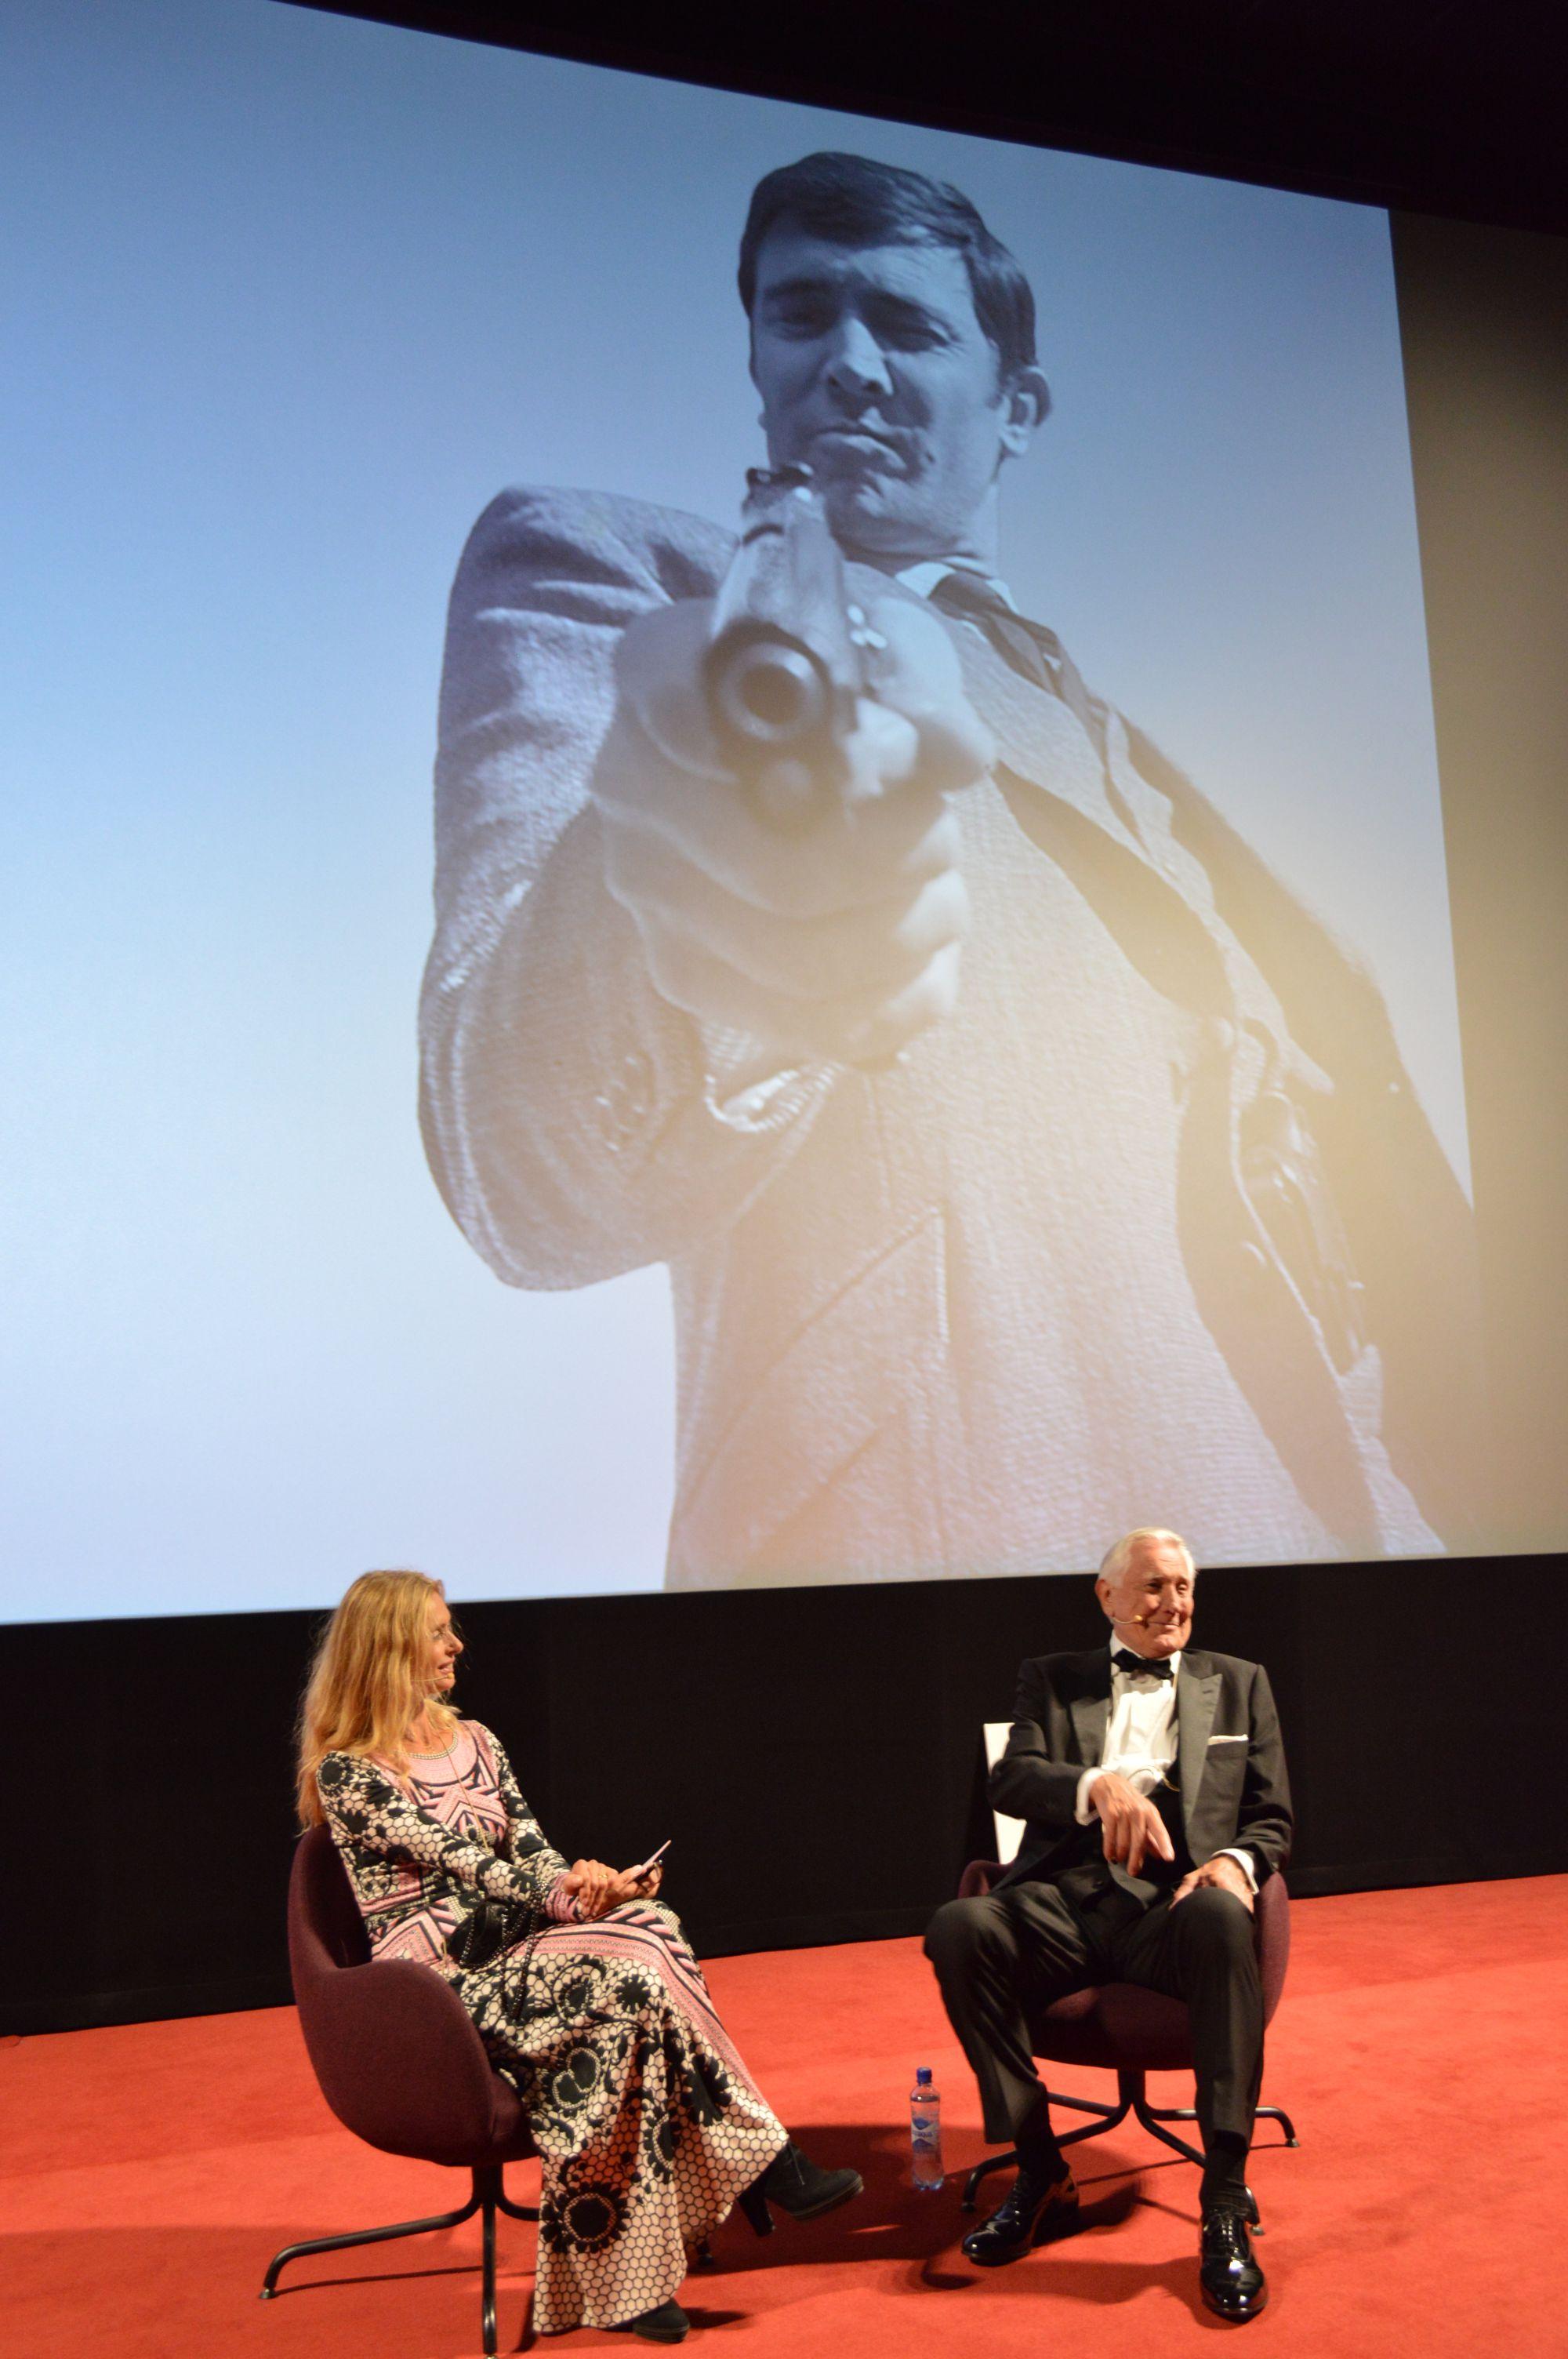 Maryam d'Abo og George Lazenby i Vika Kino, Oslo 01.09.2016 - © Brian Iskov